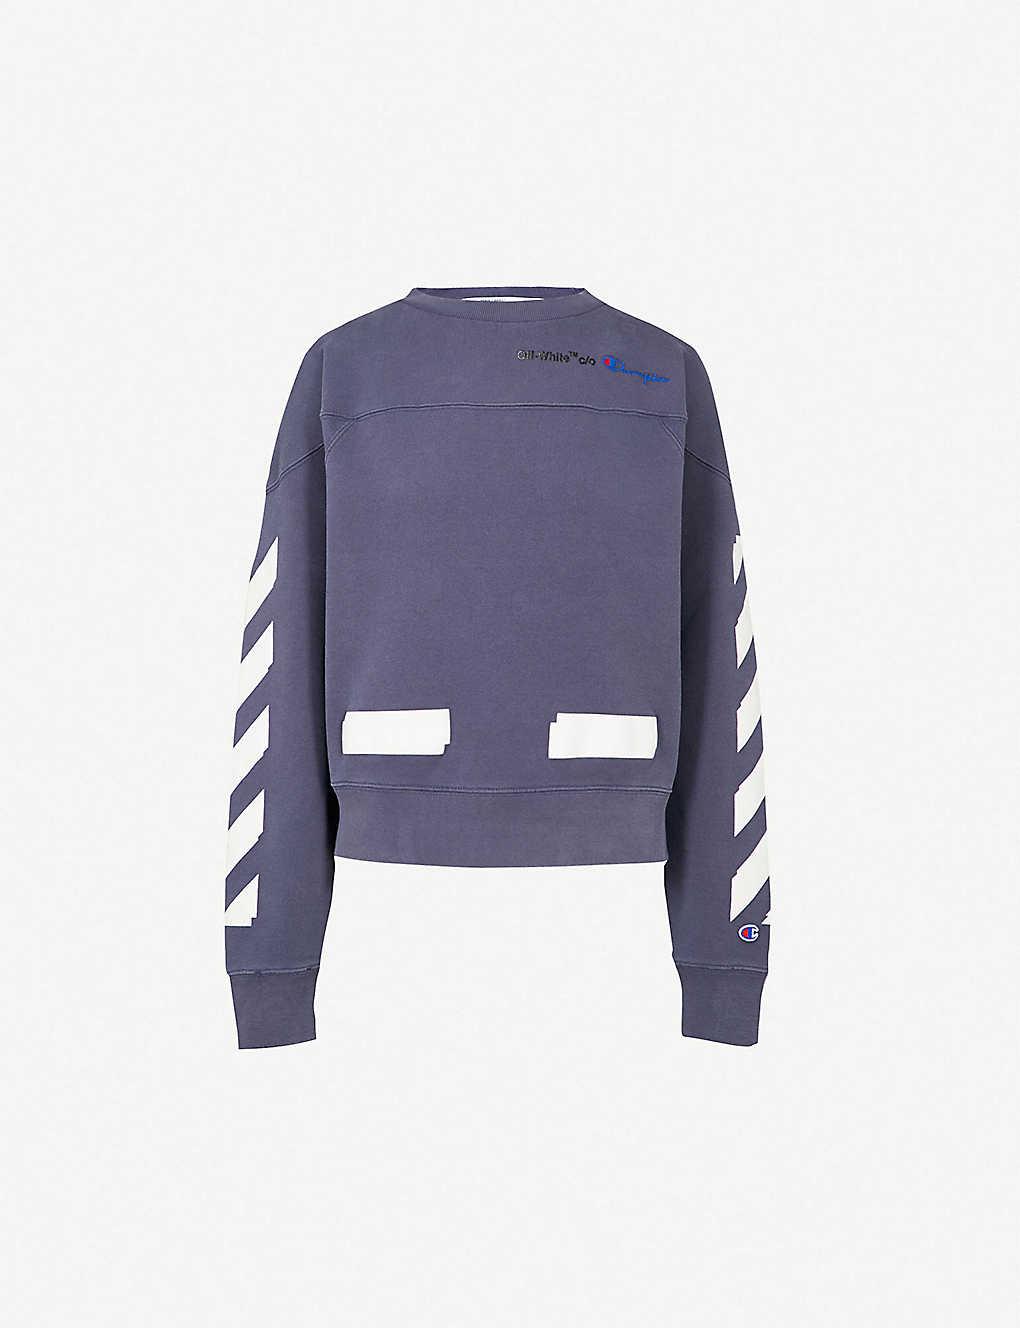 ea3dd840cc73 OFF-WHITE C O VIRGIL ABLOH - Champion cotton-blend sweatshirt ...